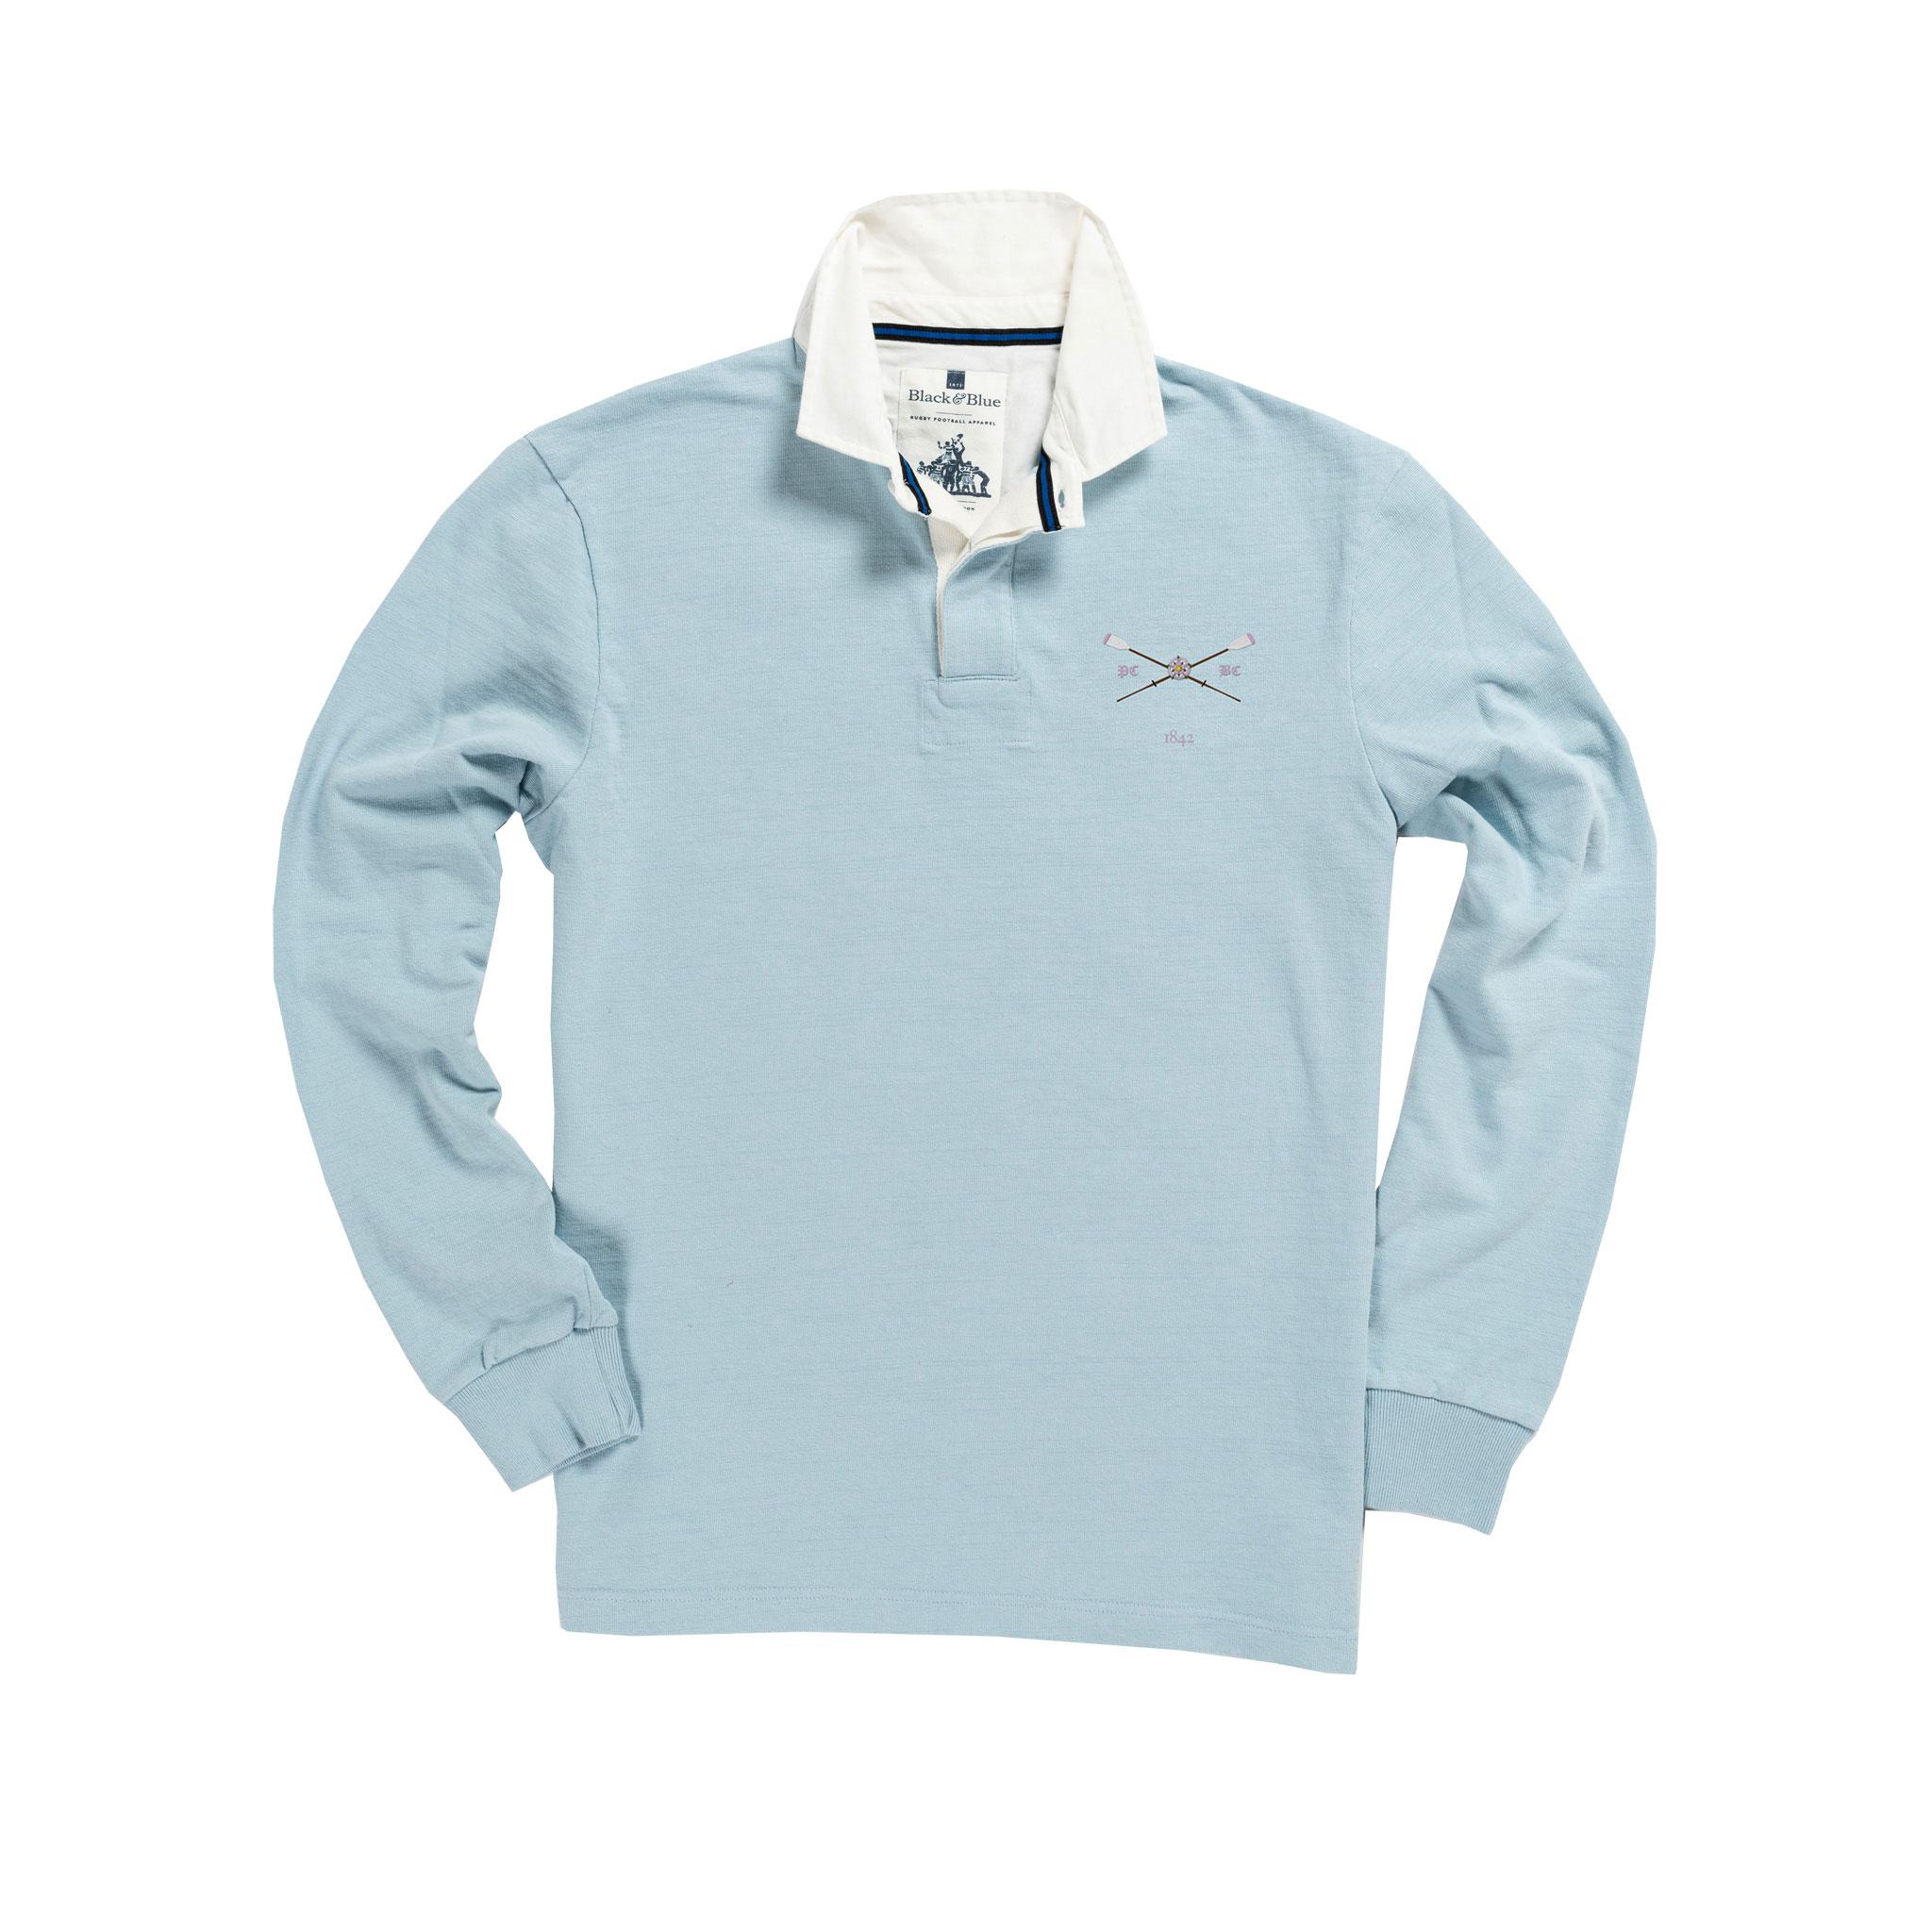 Pembroke 1842 Rugby Shirt_Front